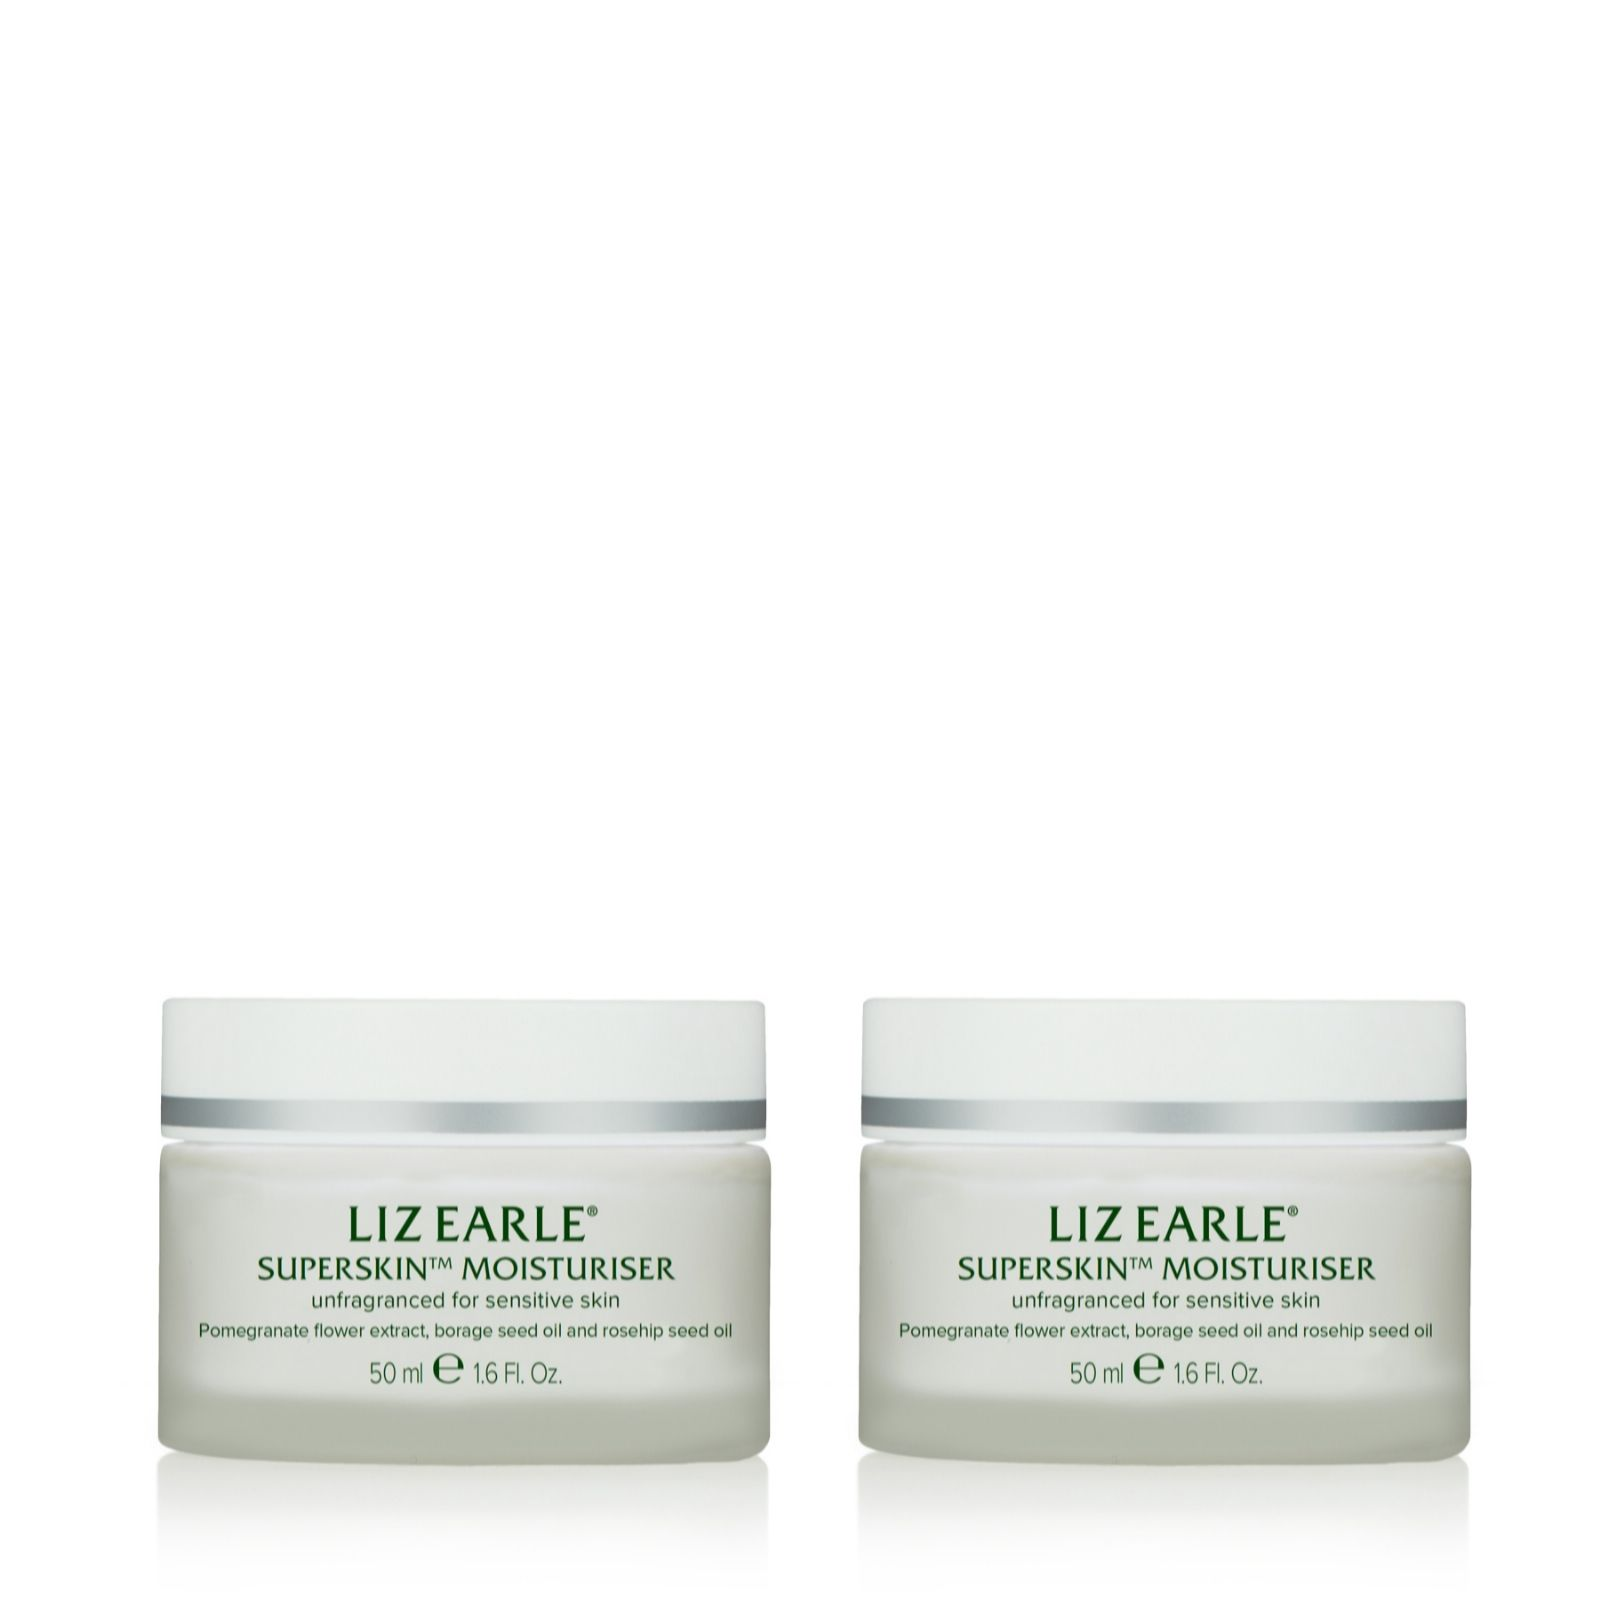 Liz earle oil free moisturiser